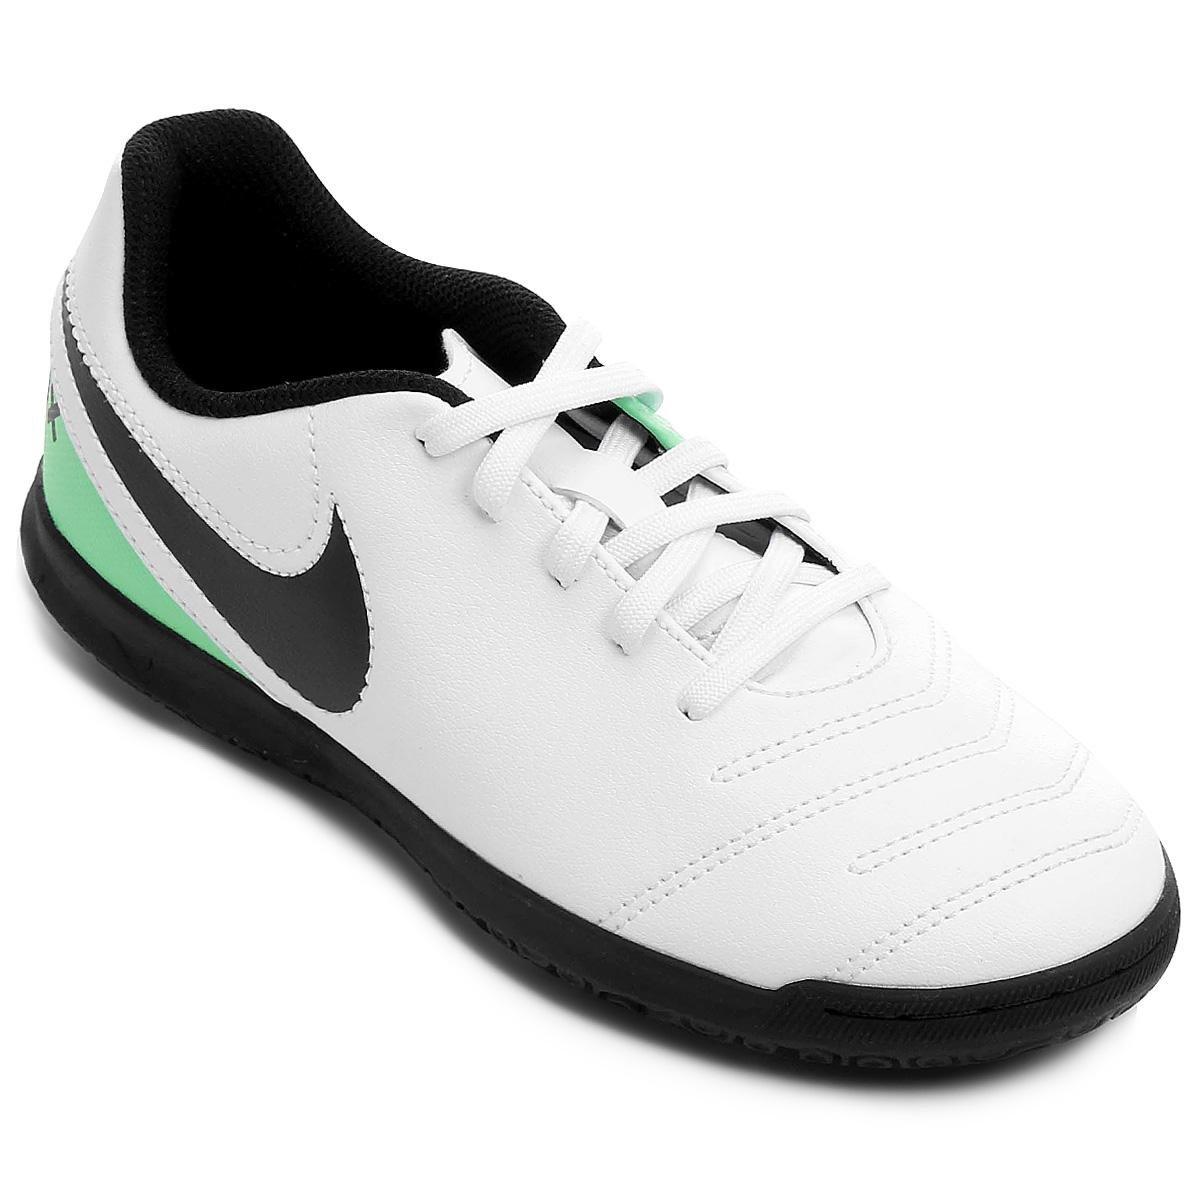 Chuteira Futsal Infantil Nike Tiempo Rio 3 IC - Compre Agora  93a81892a0bfc